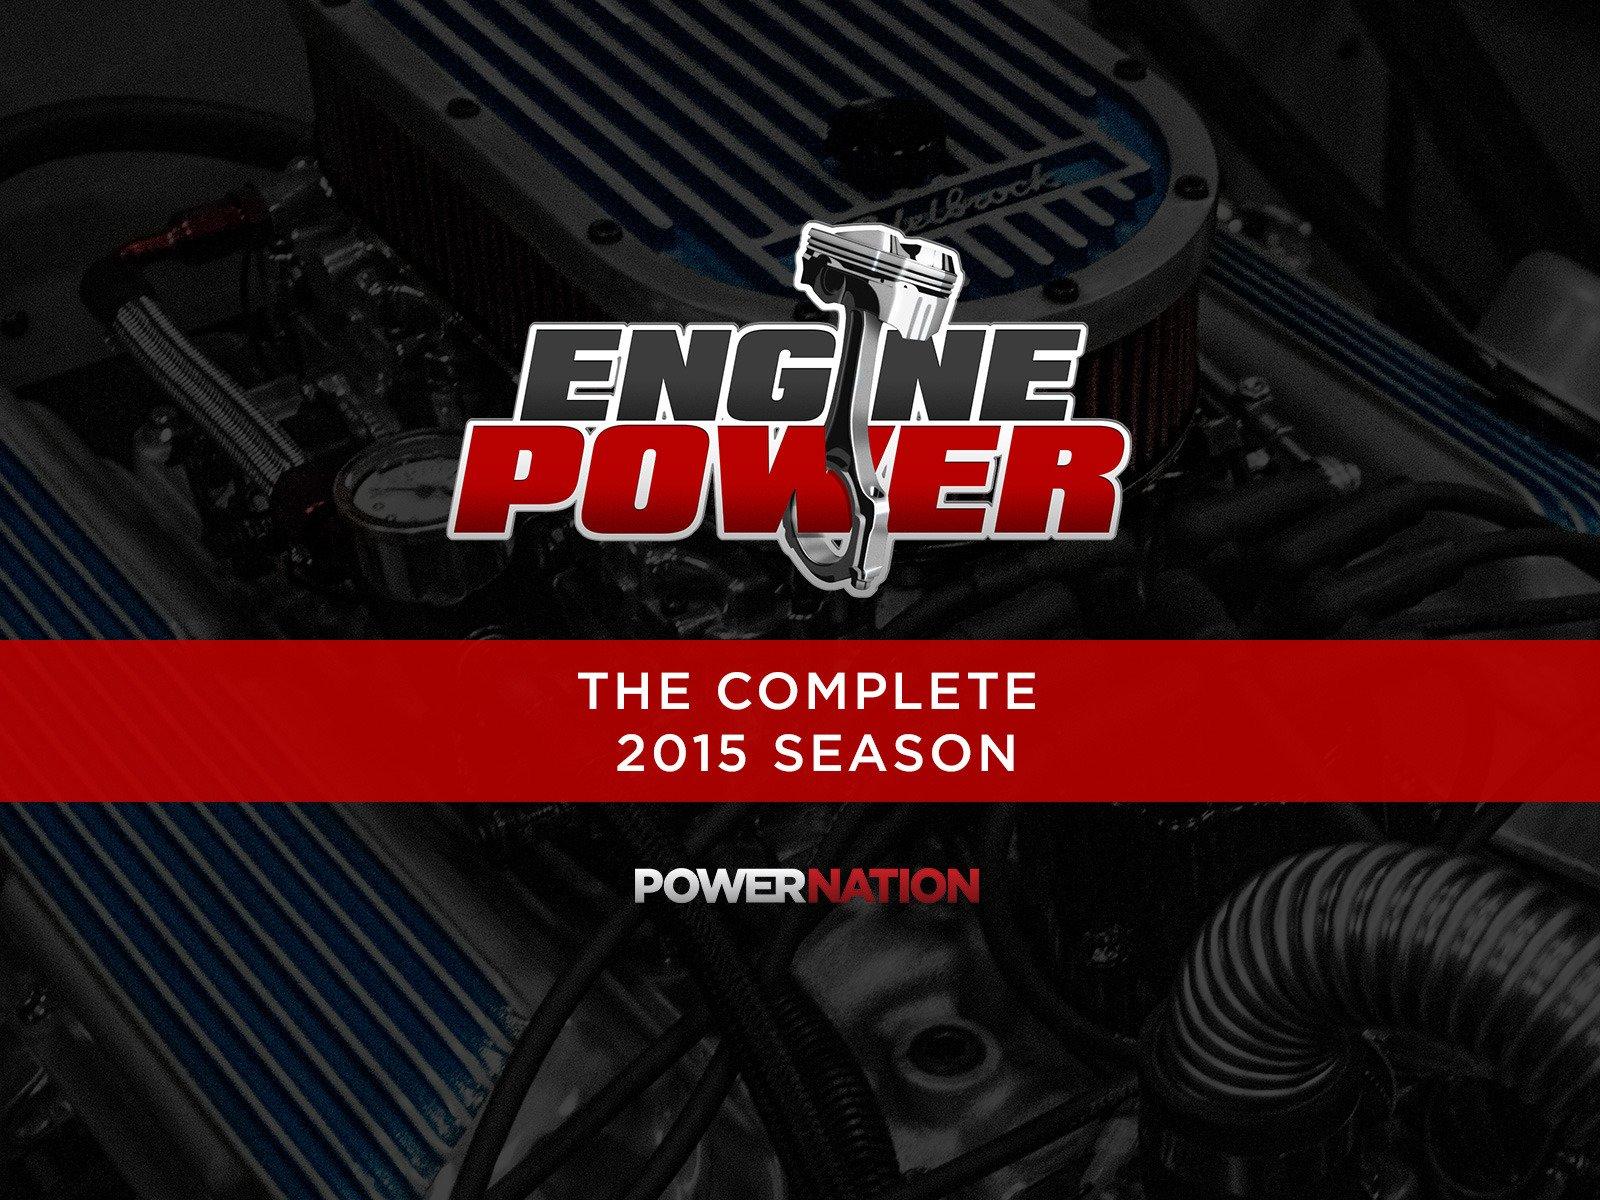 Engine Power - Season 2015